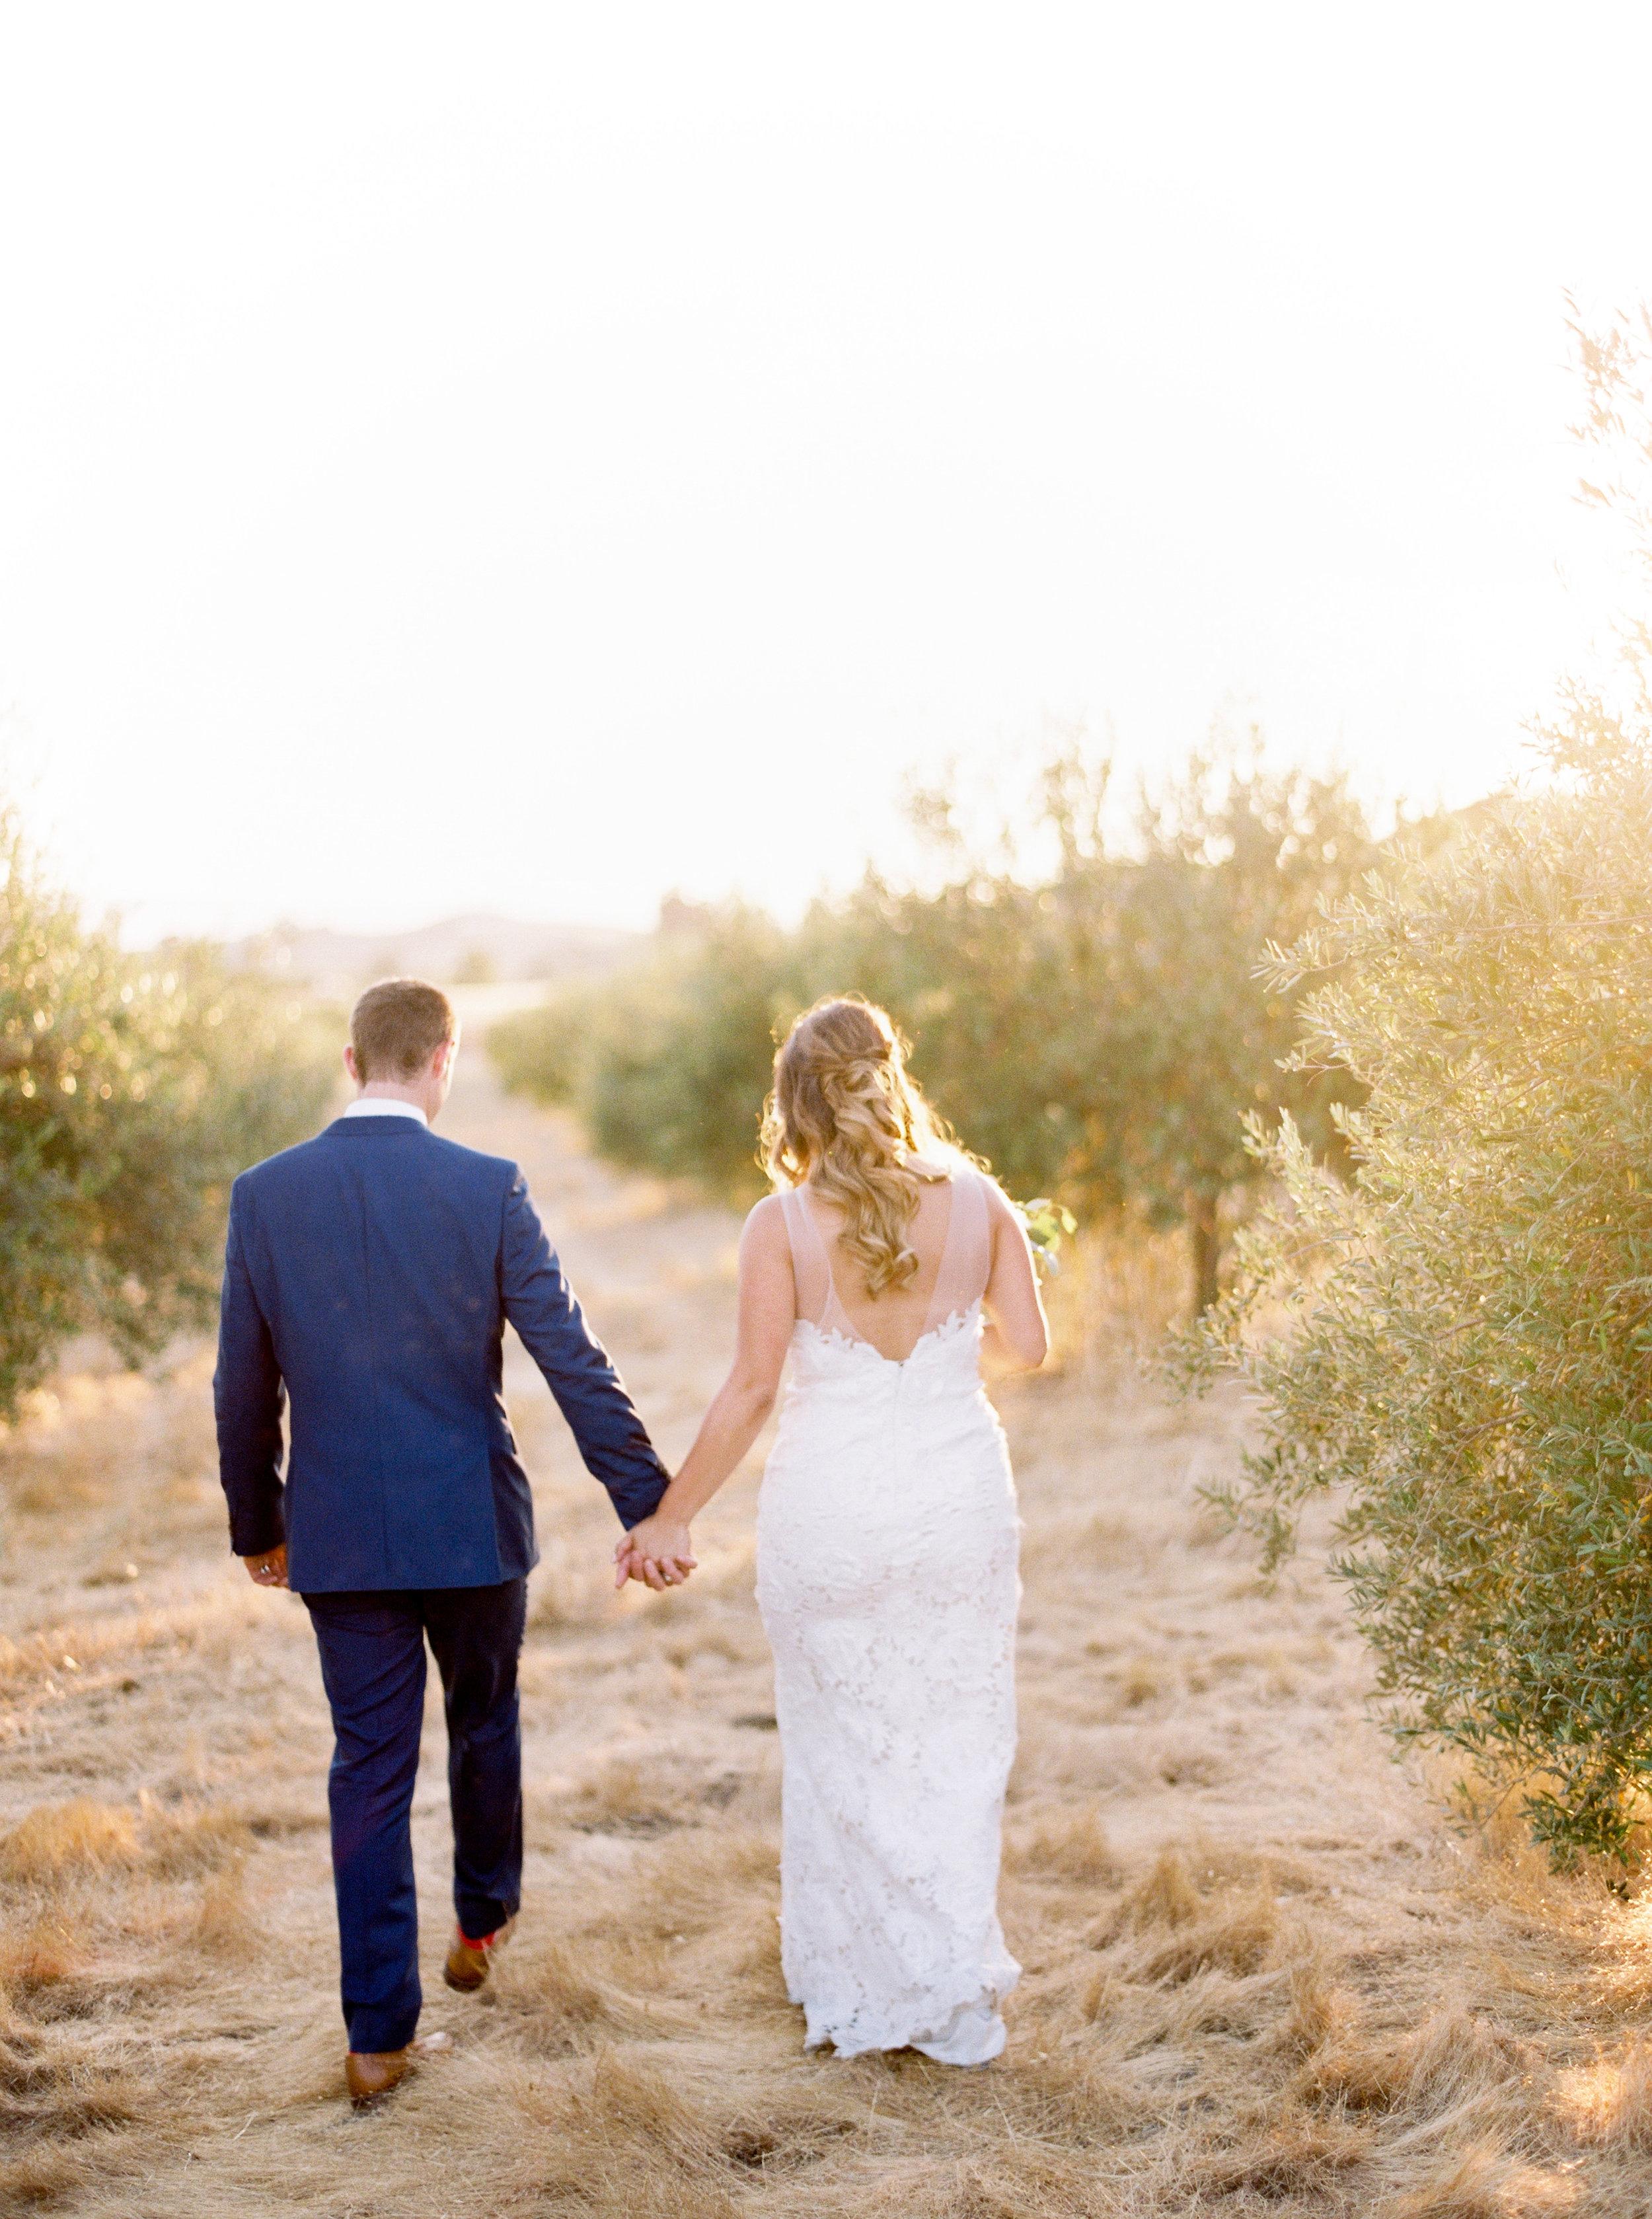 the-purple-orchid-resort-wedding-in-livermore-california-70.jpg